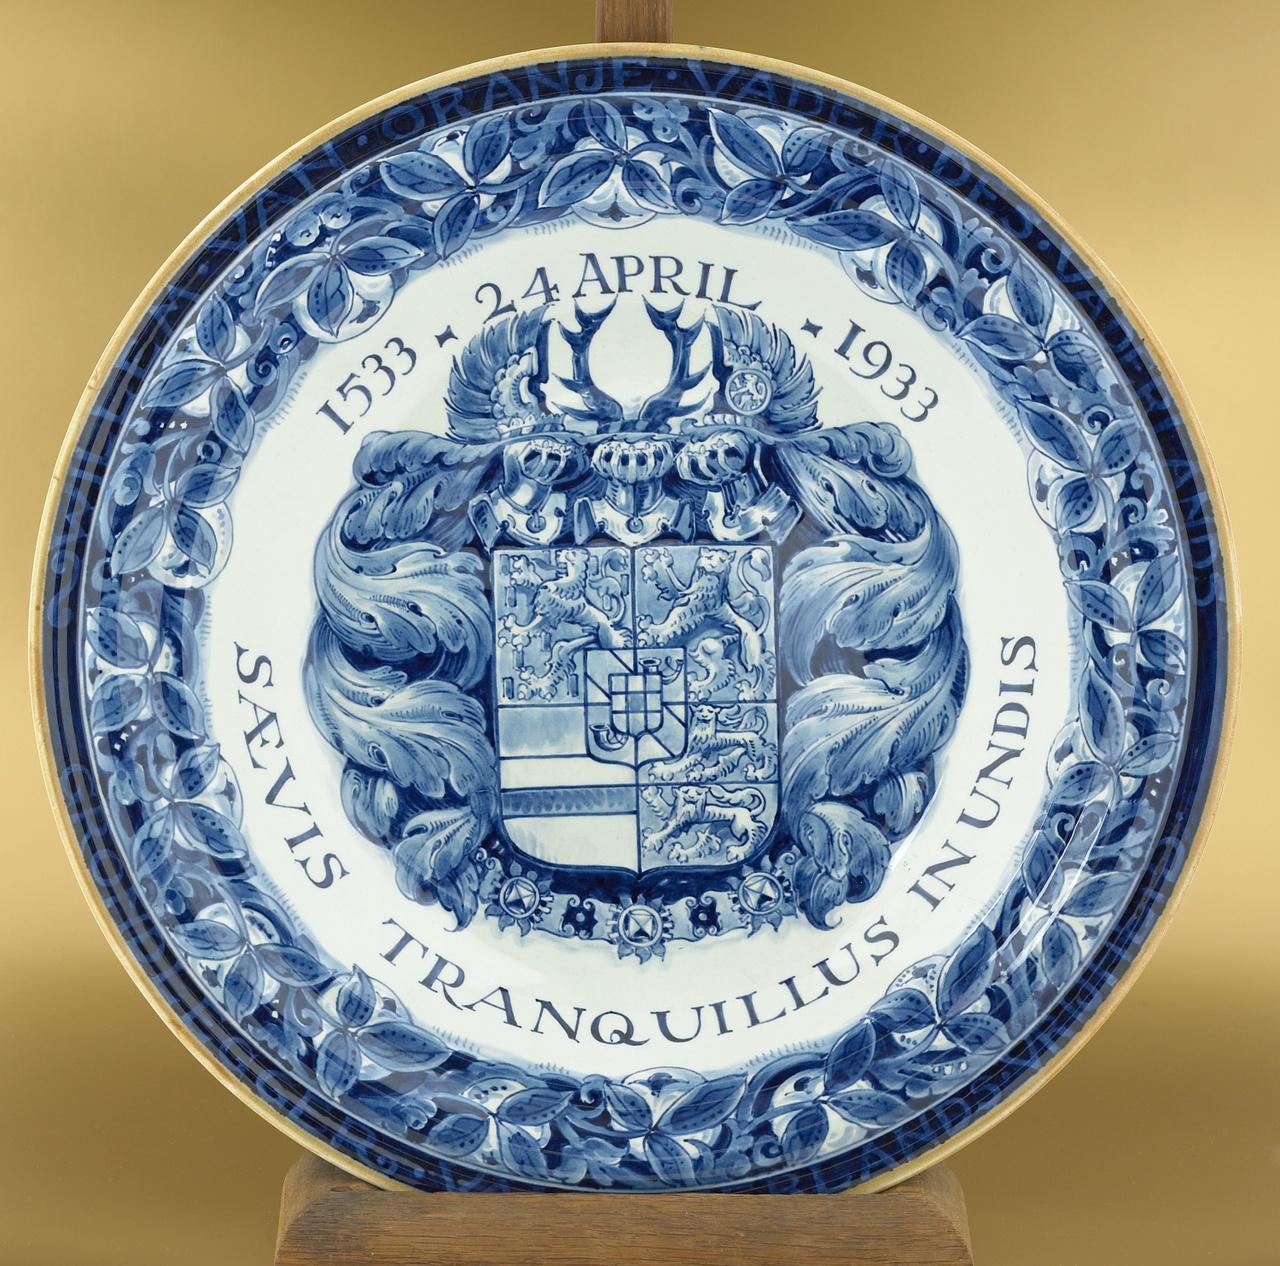 Herinneringsbord Willem van Oranje, De Porceleyne Fles